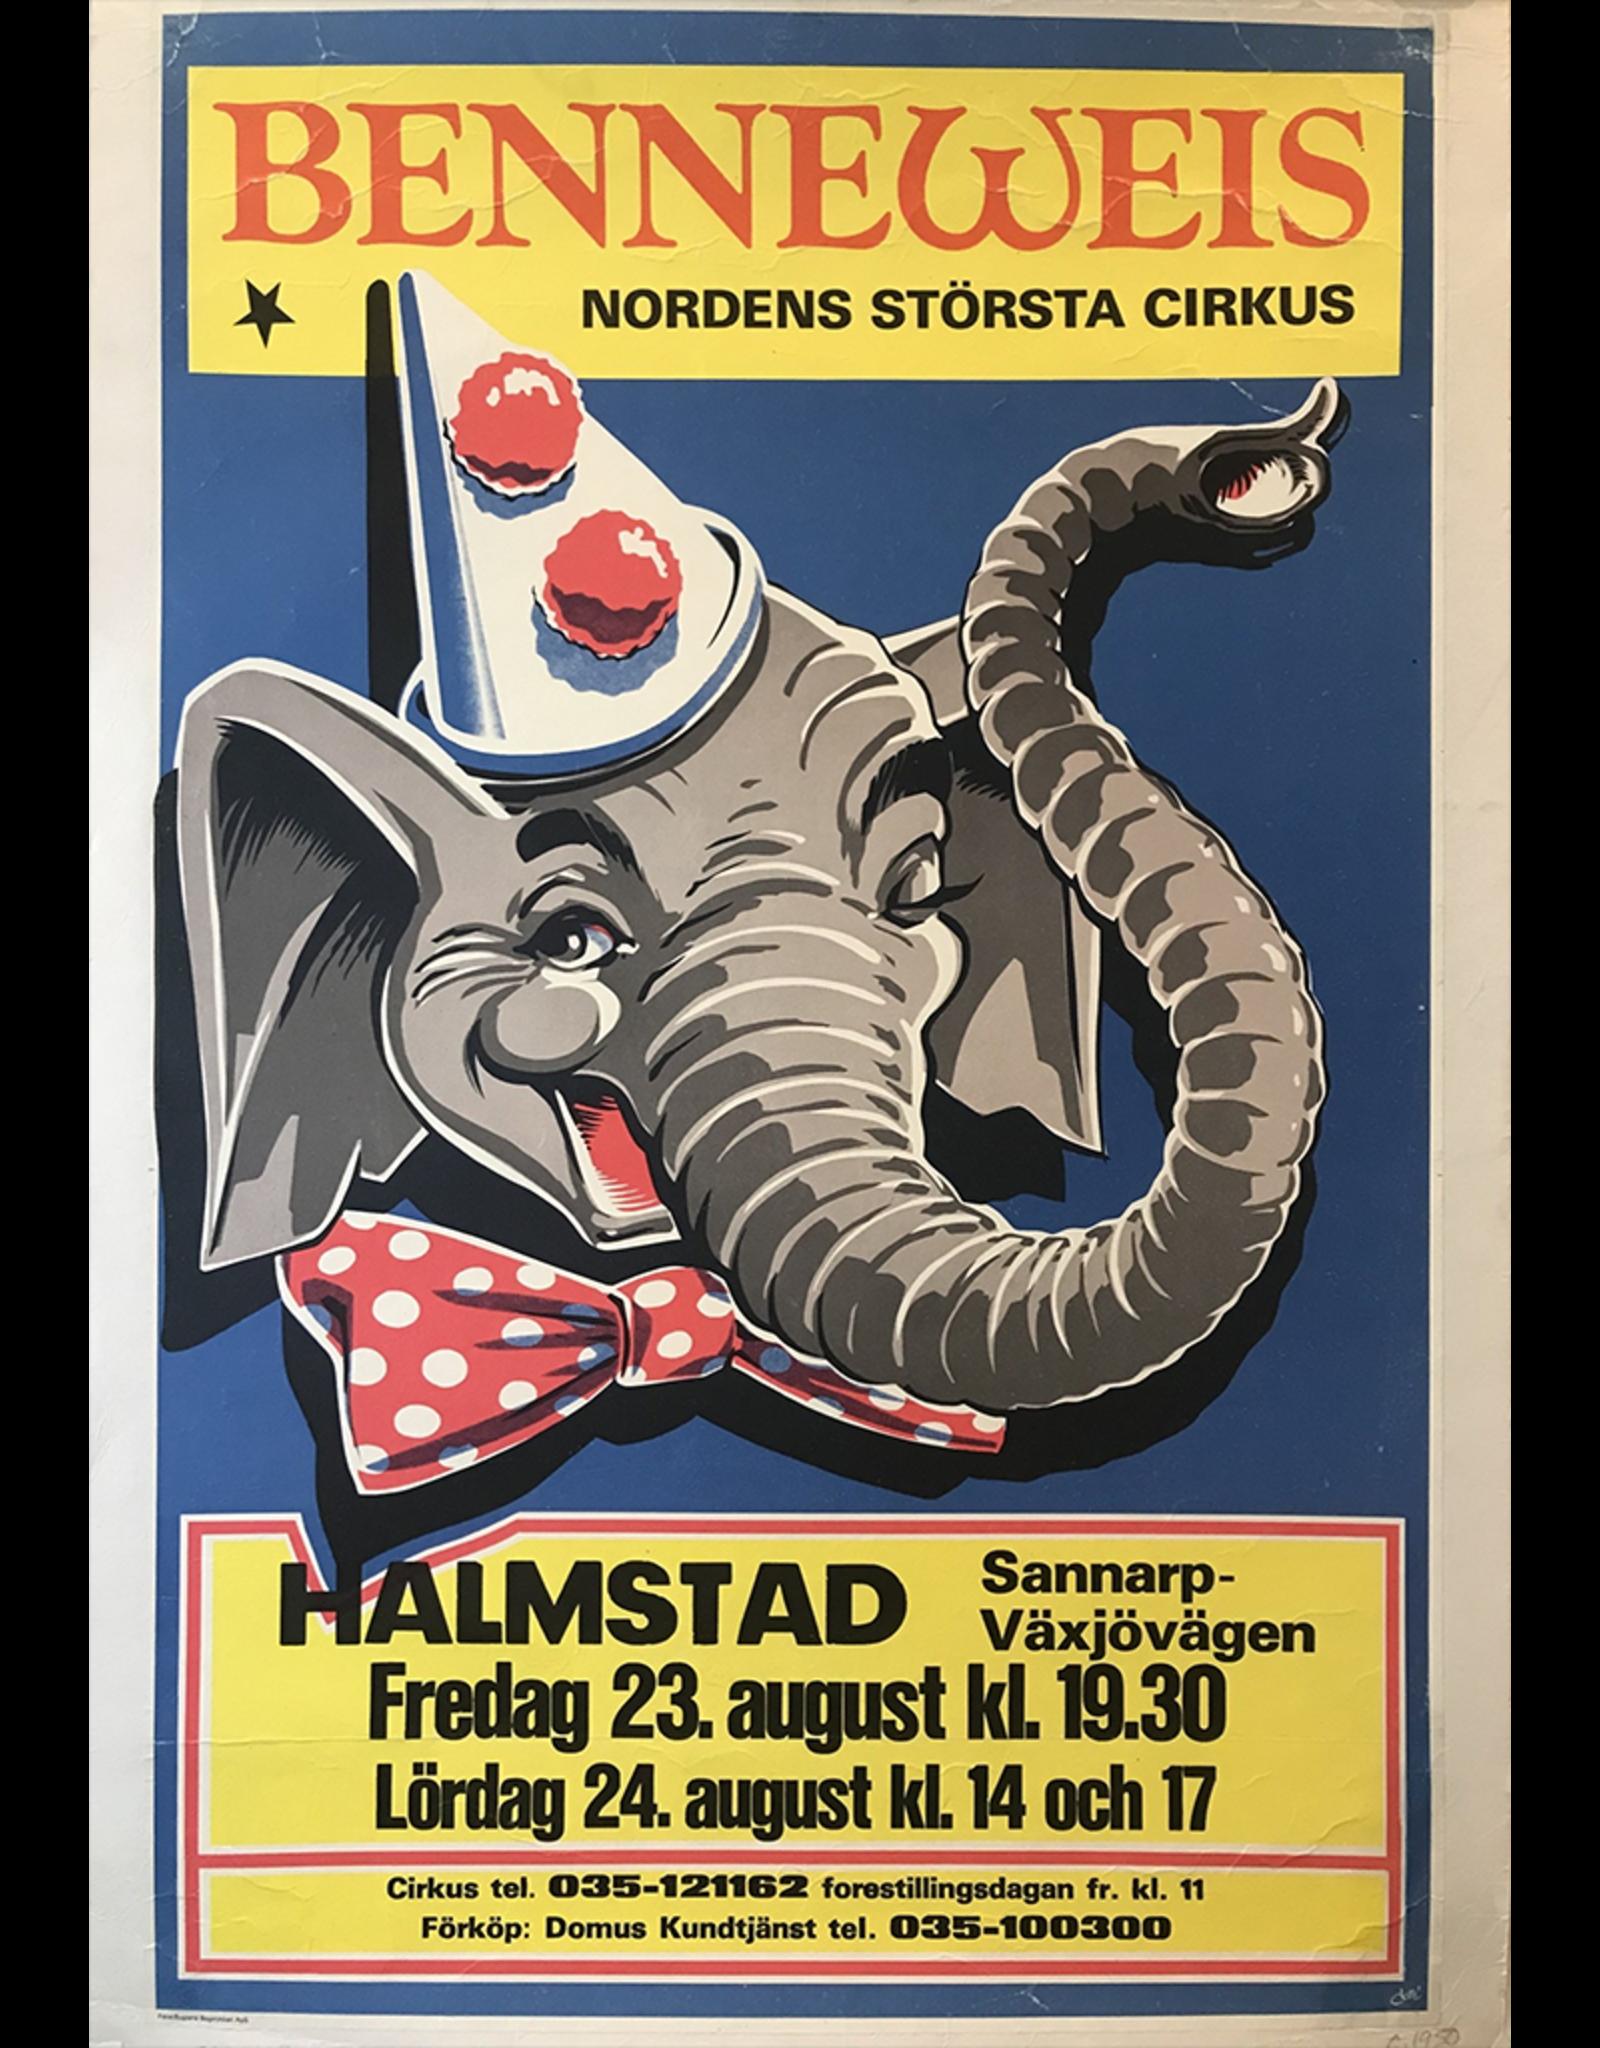 SPV Benneweus Cirkus